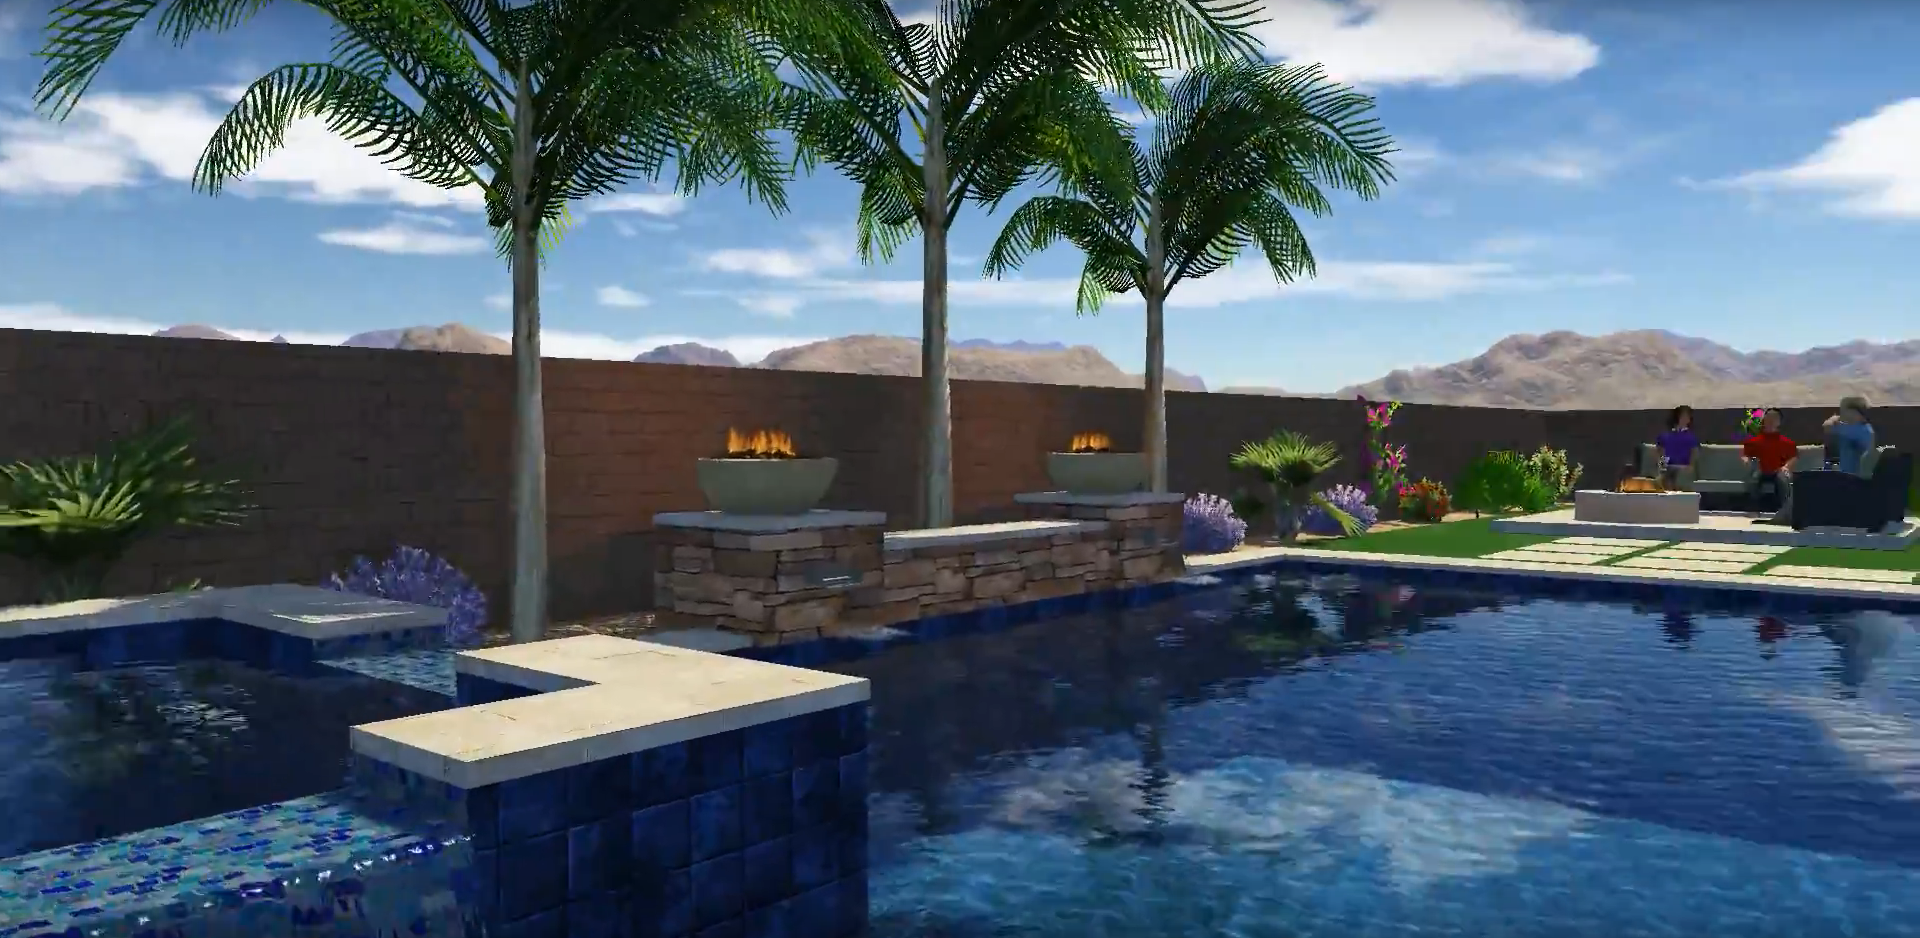 Dream to Reality: The Pierce Family's Backyard Oasis